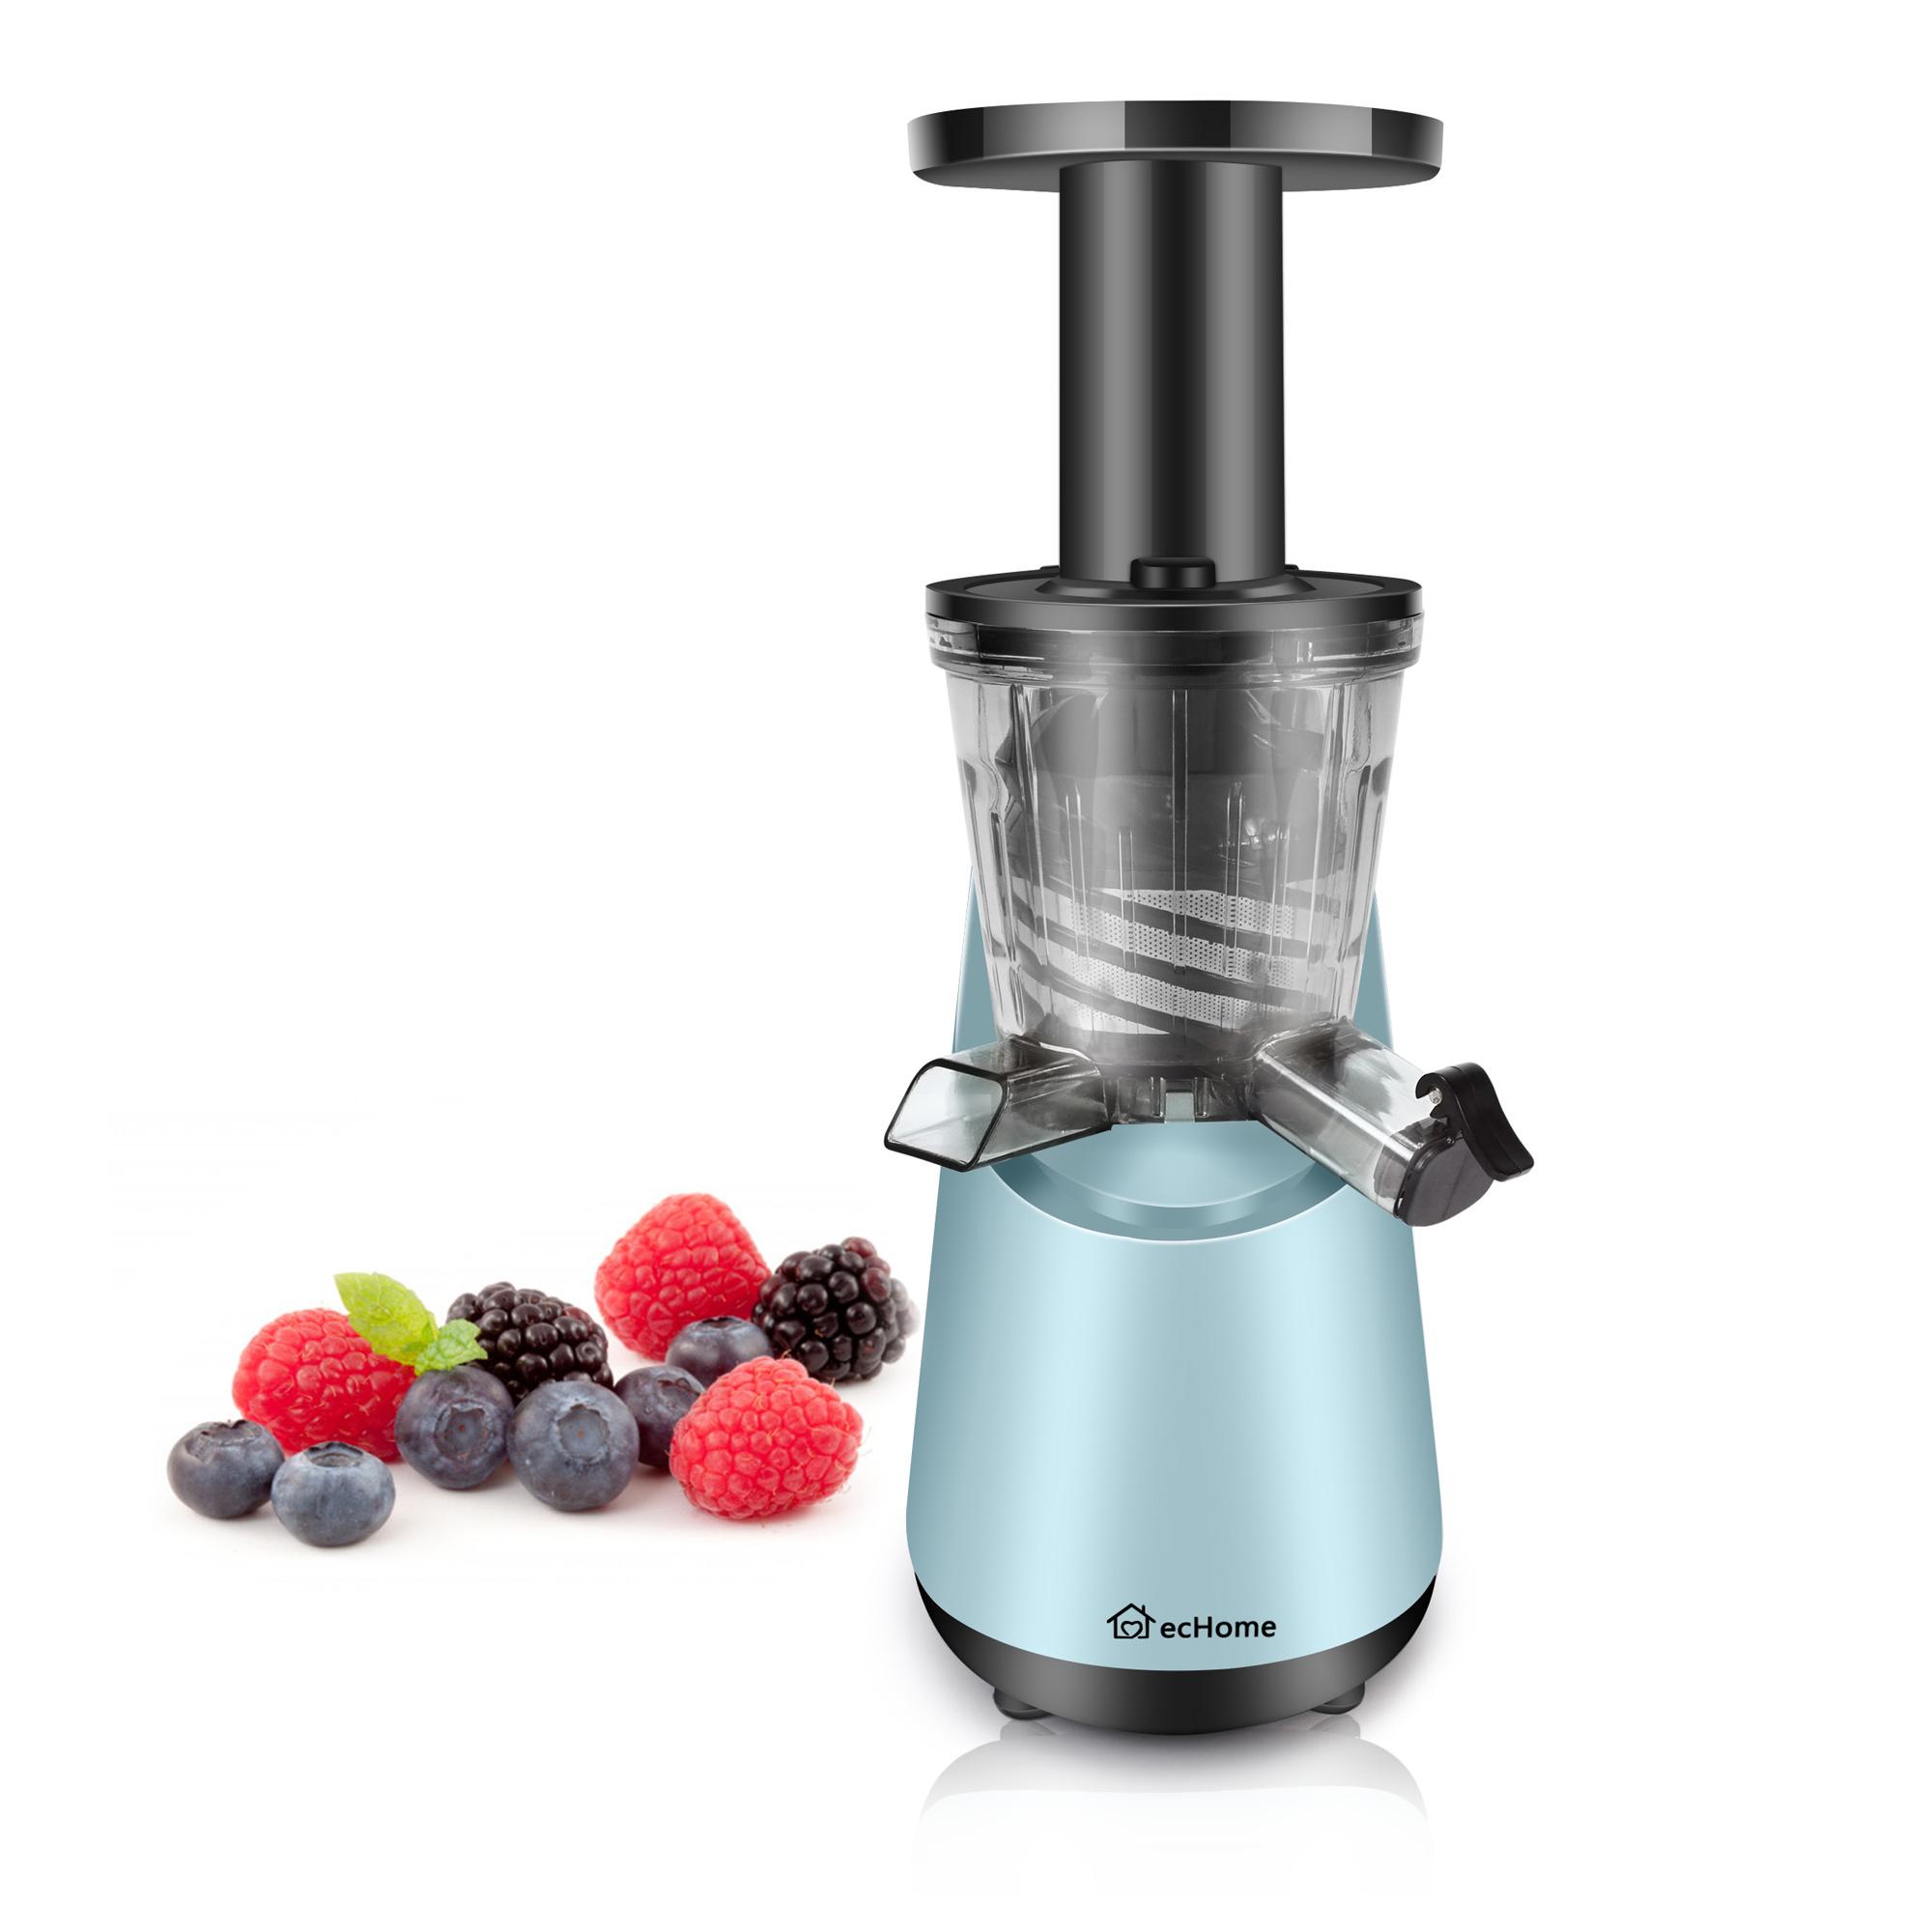 Qoo10 ecHome Slow Juicer Fruit Vegetable Cold Press Juice